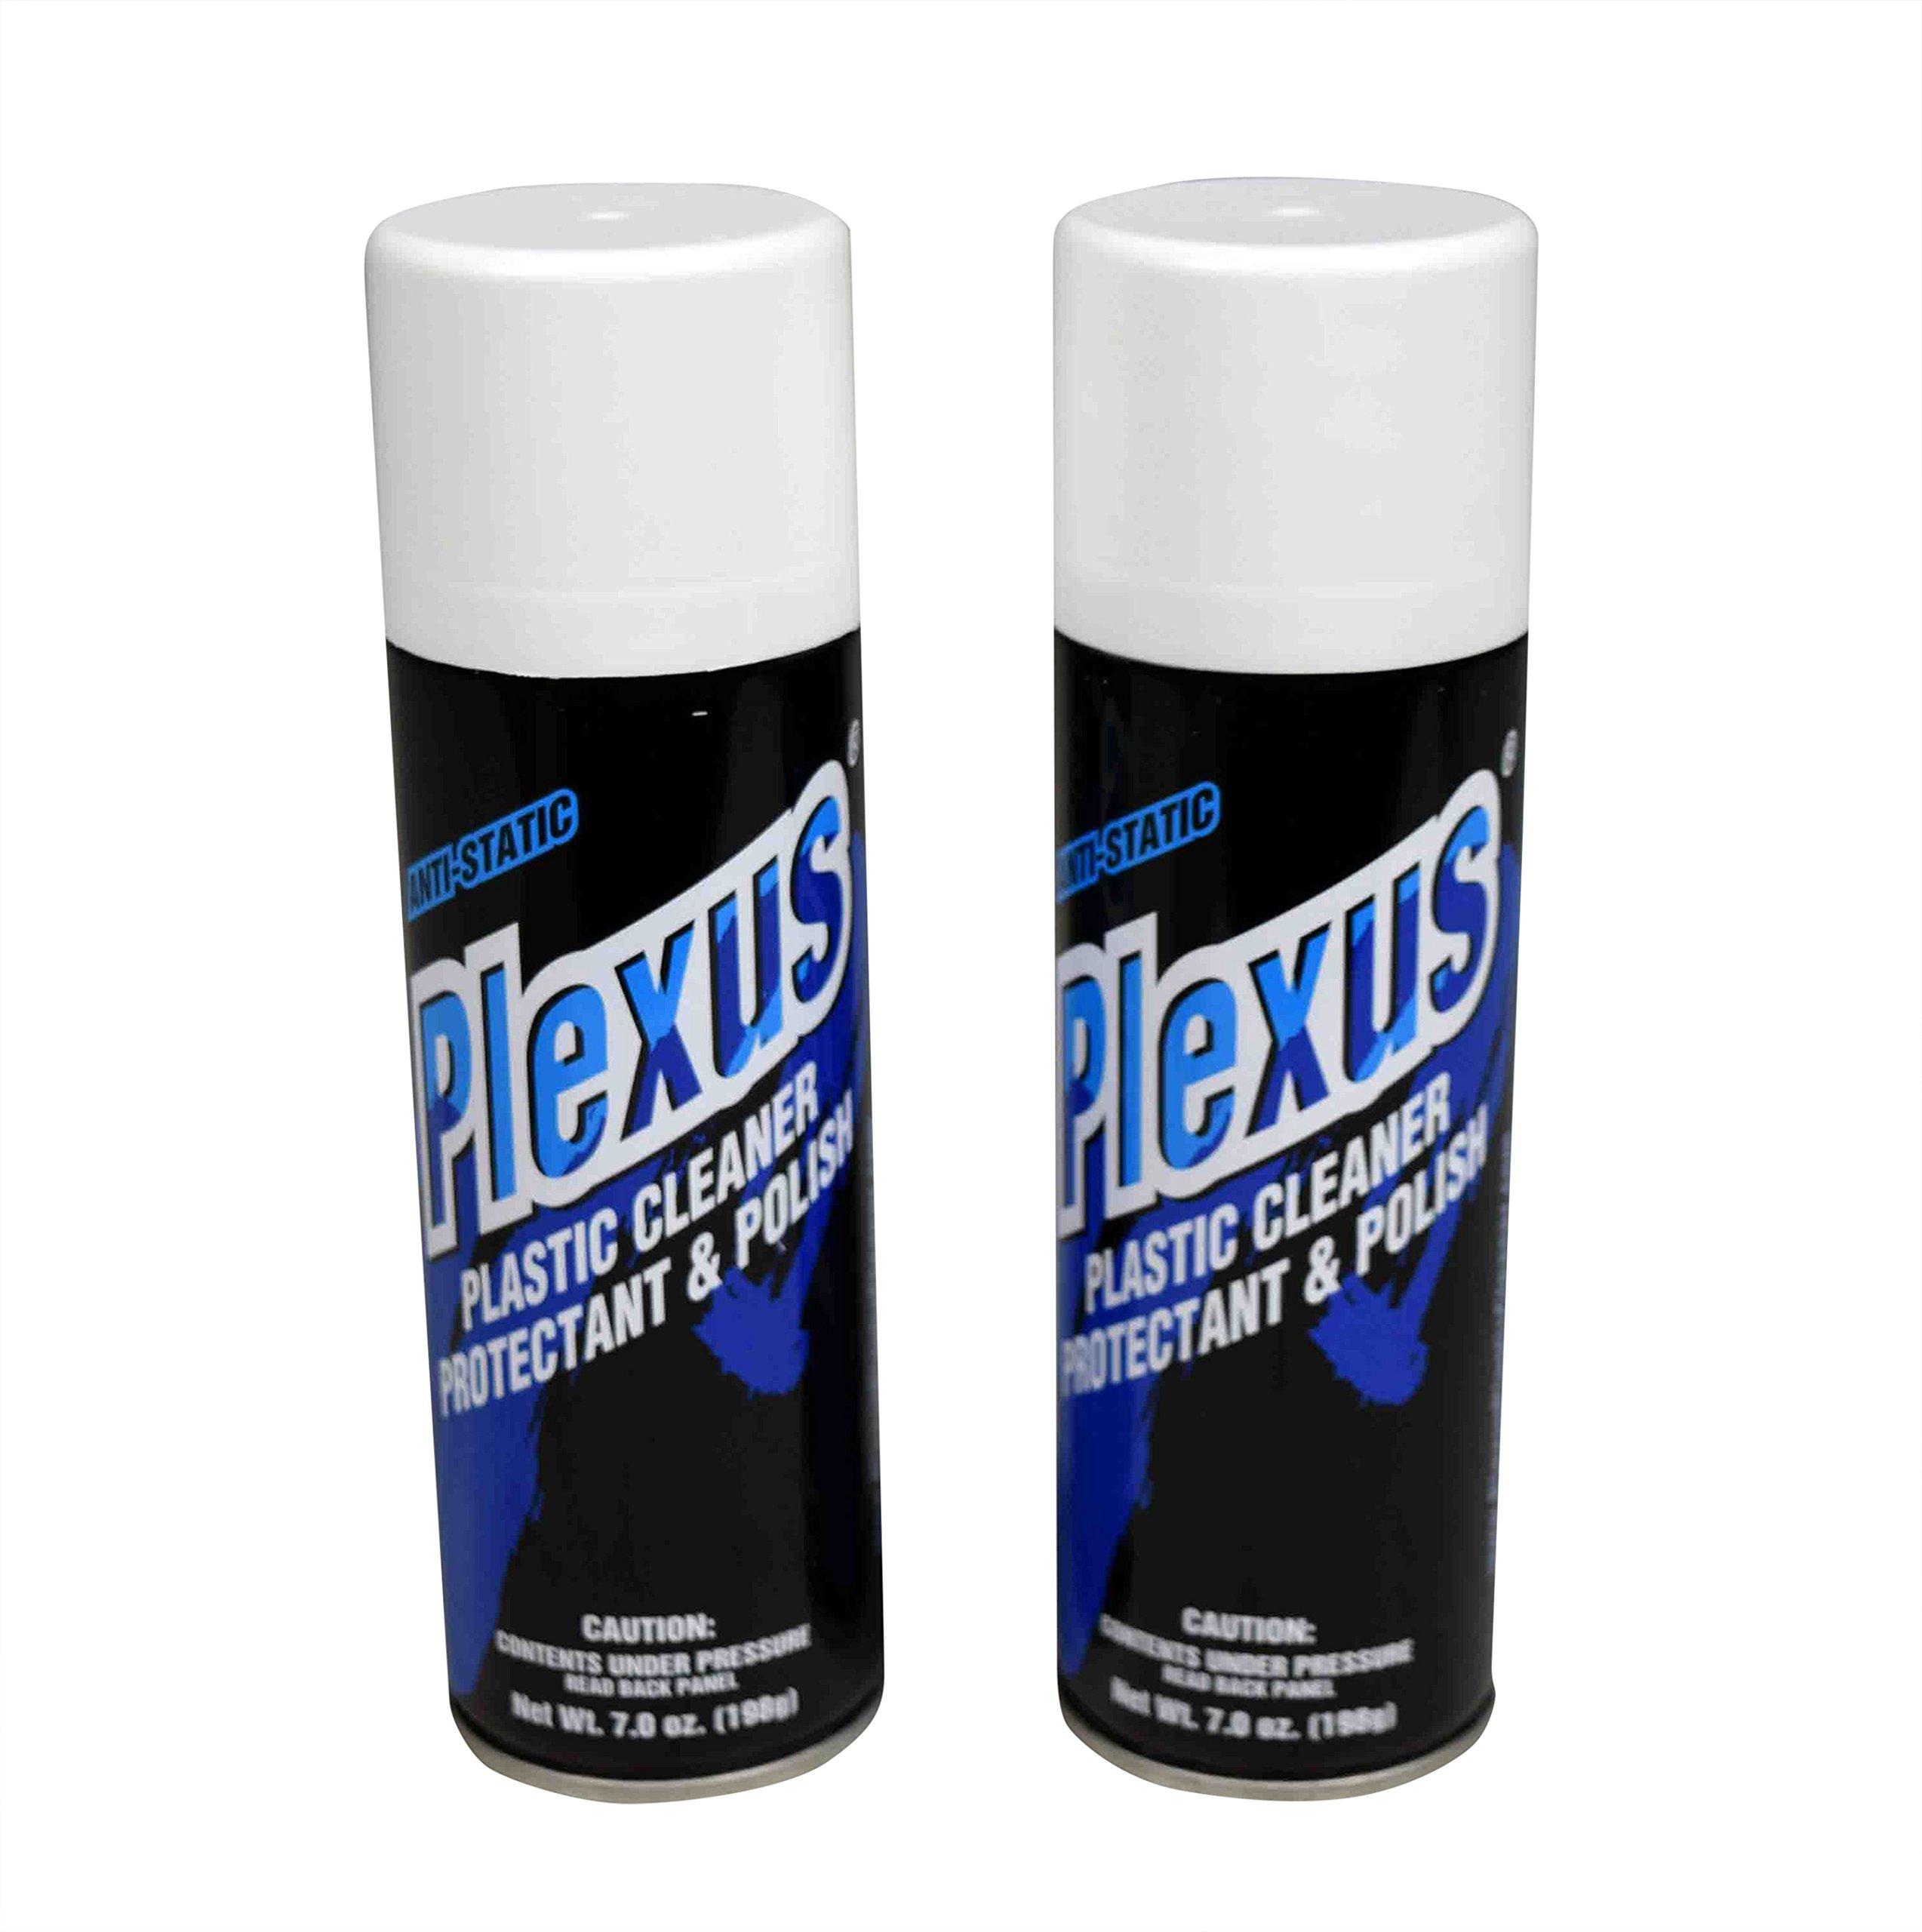 Plexus Motocycle Plastic Cleaner and Protectant 20207 7oz Aerosol (2)